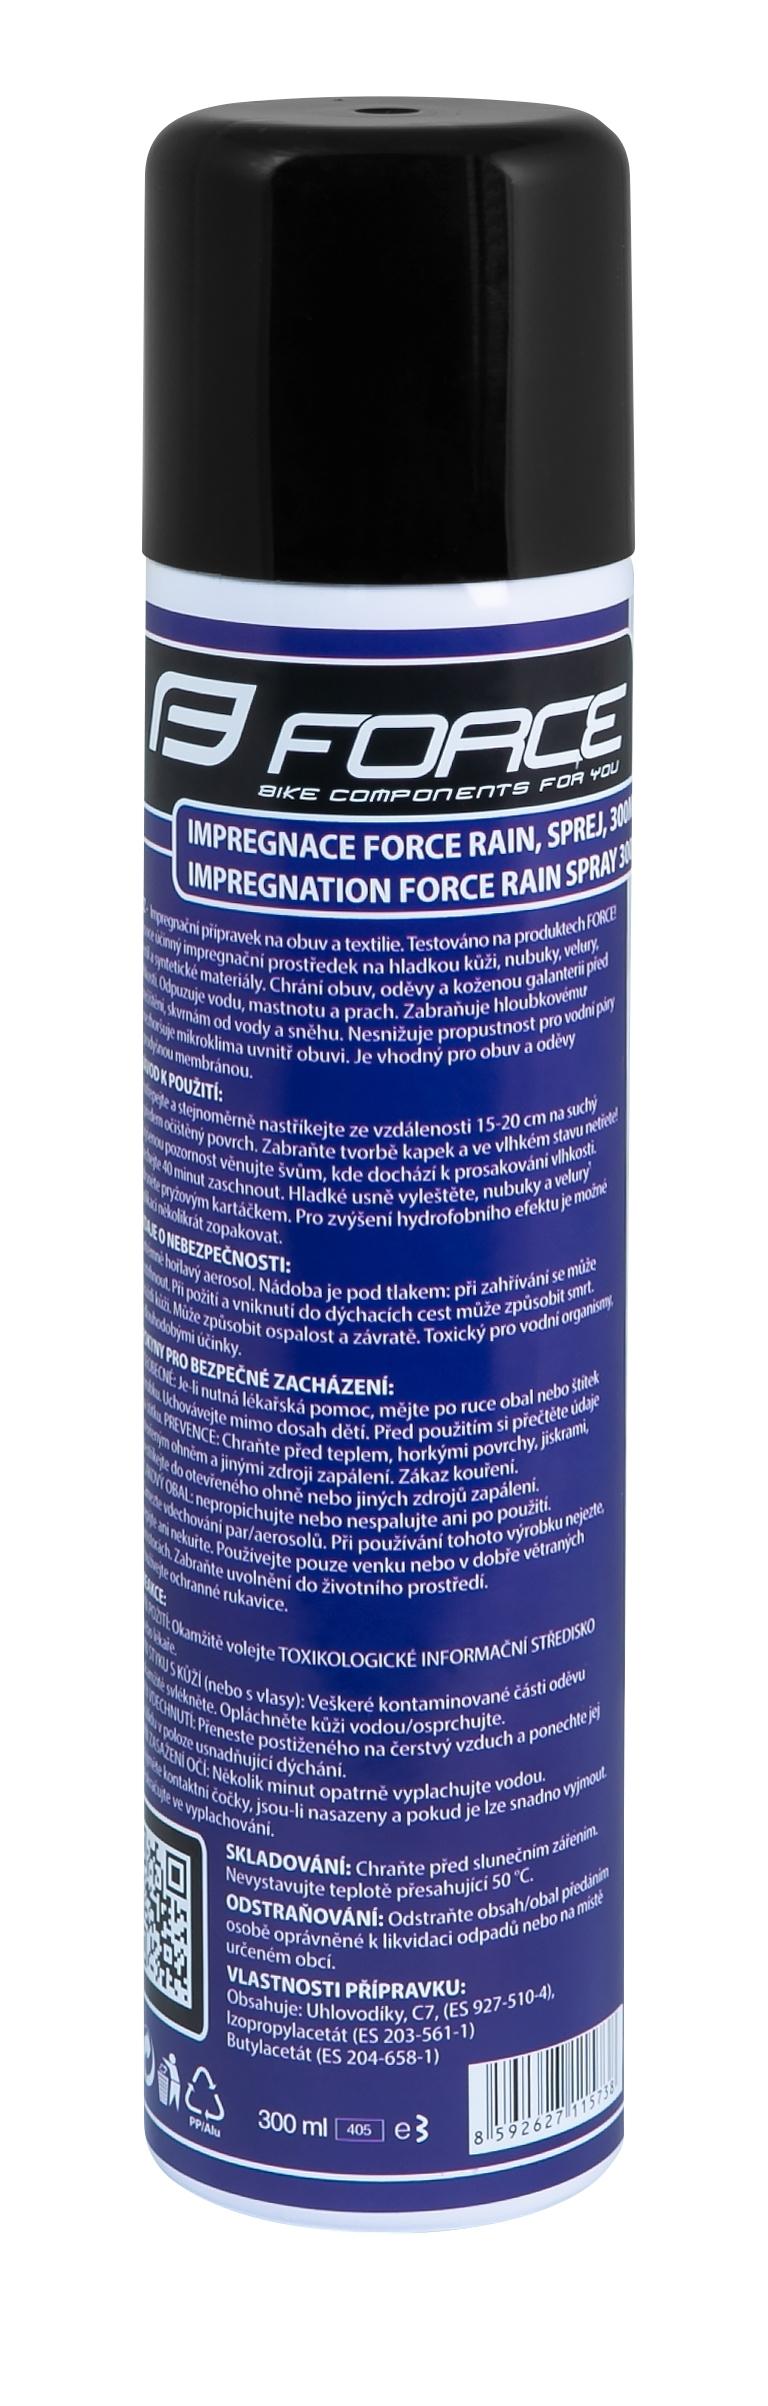 Impregnace FORCE Rain, sprej, 300ml